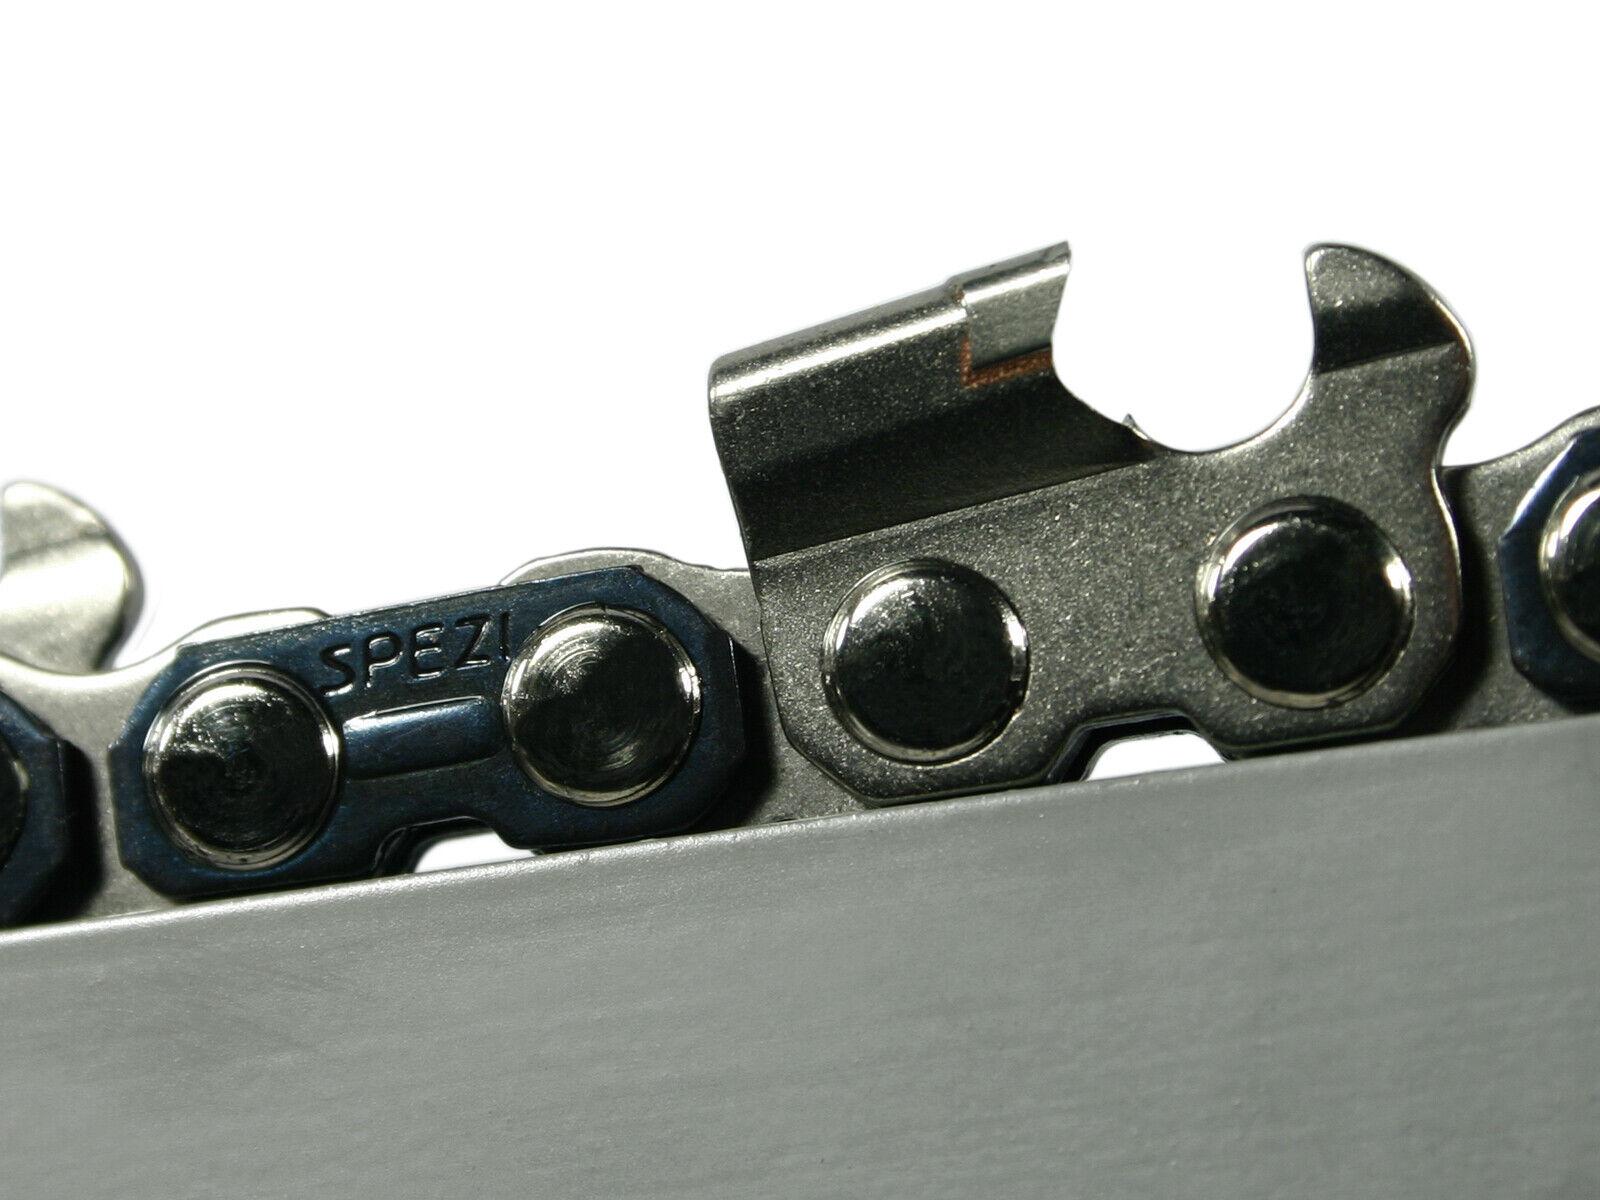 Metal duro cadena sierra adecuado para Husqvarna 268 60 cm 3 8  84 TG 1,5 mm Cochebide